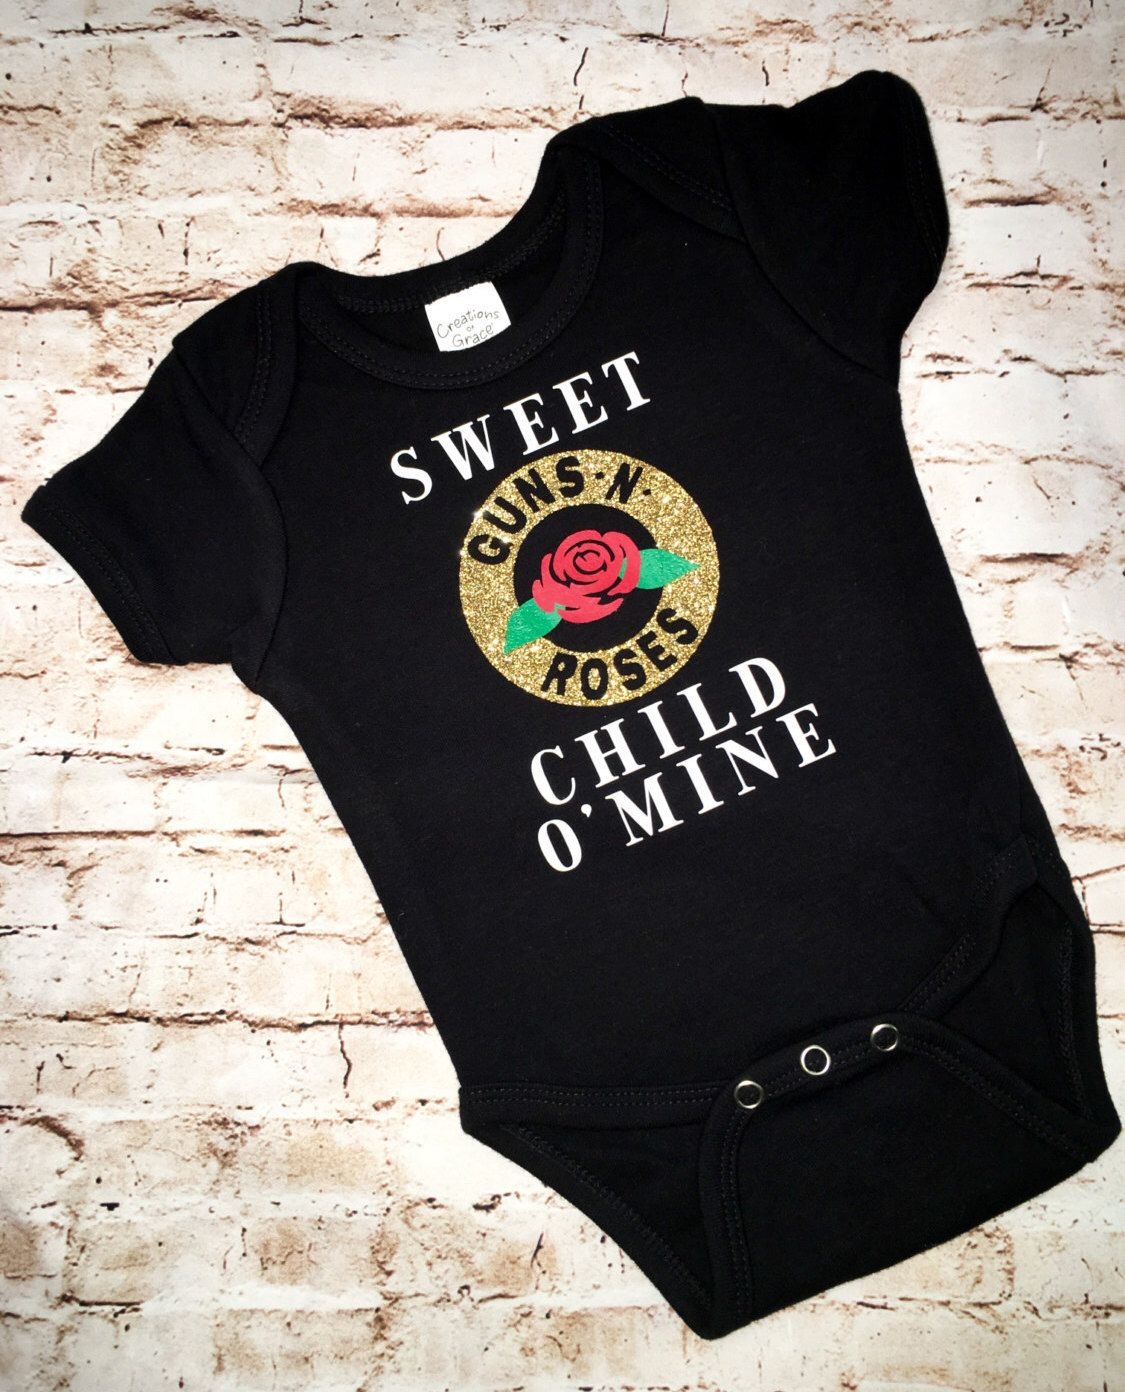 e27a1711e731 Pin by Laura Lease on FizzPopSparkleShop | Sweet child o' mine ...